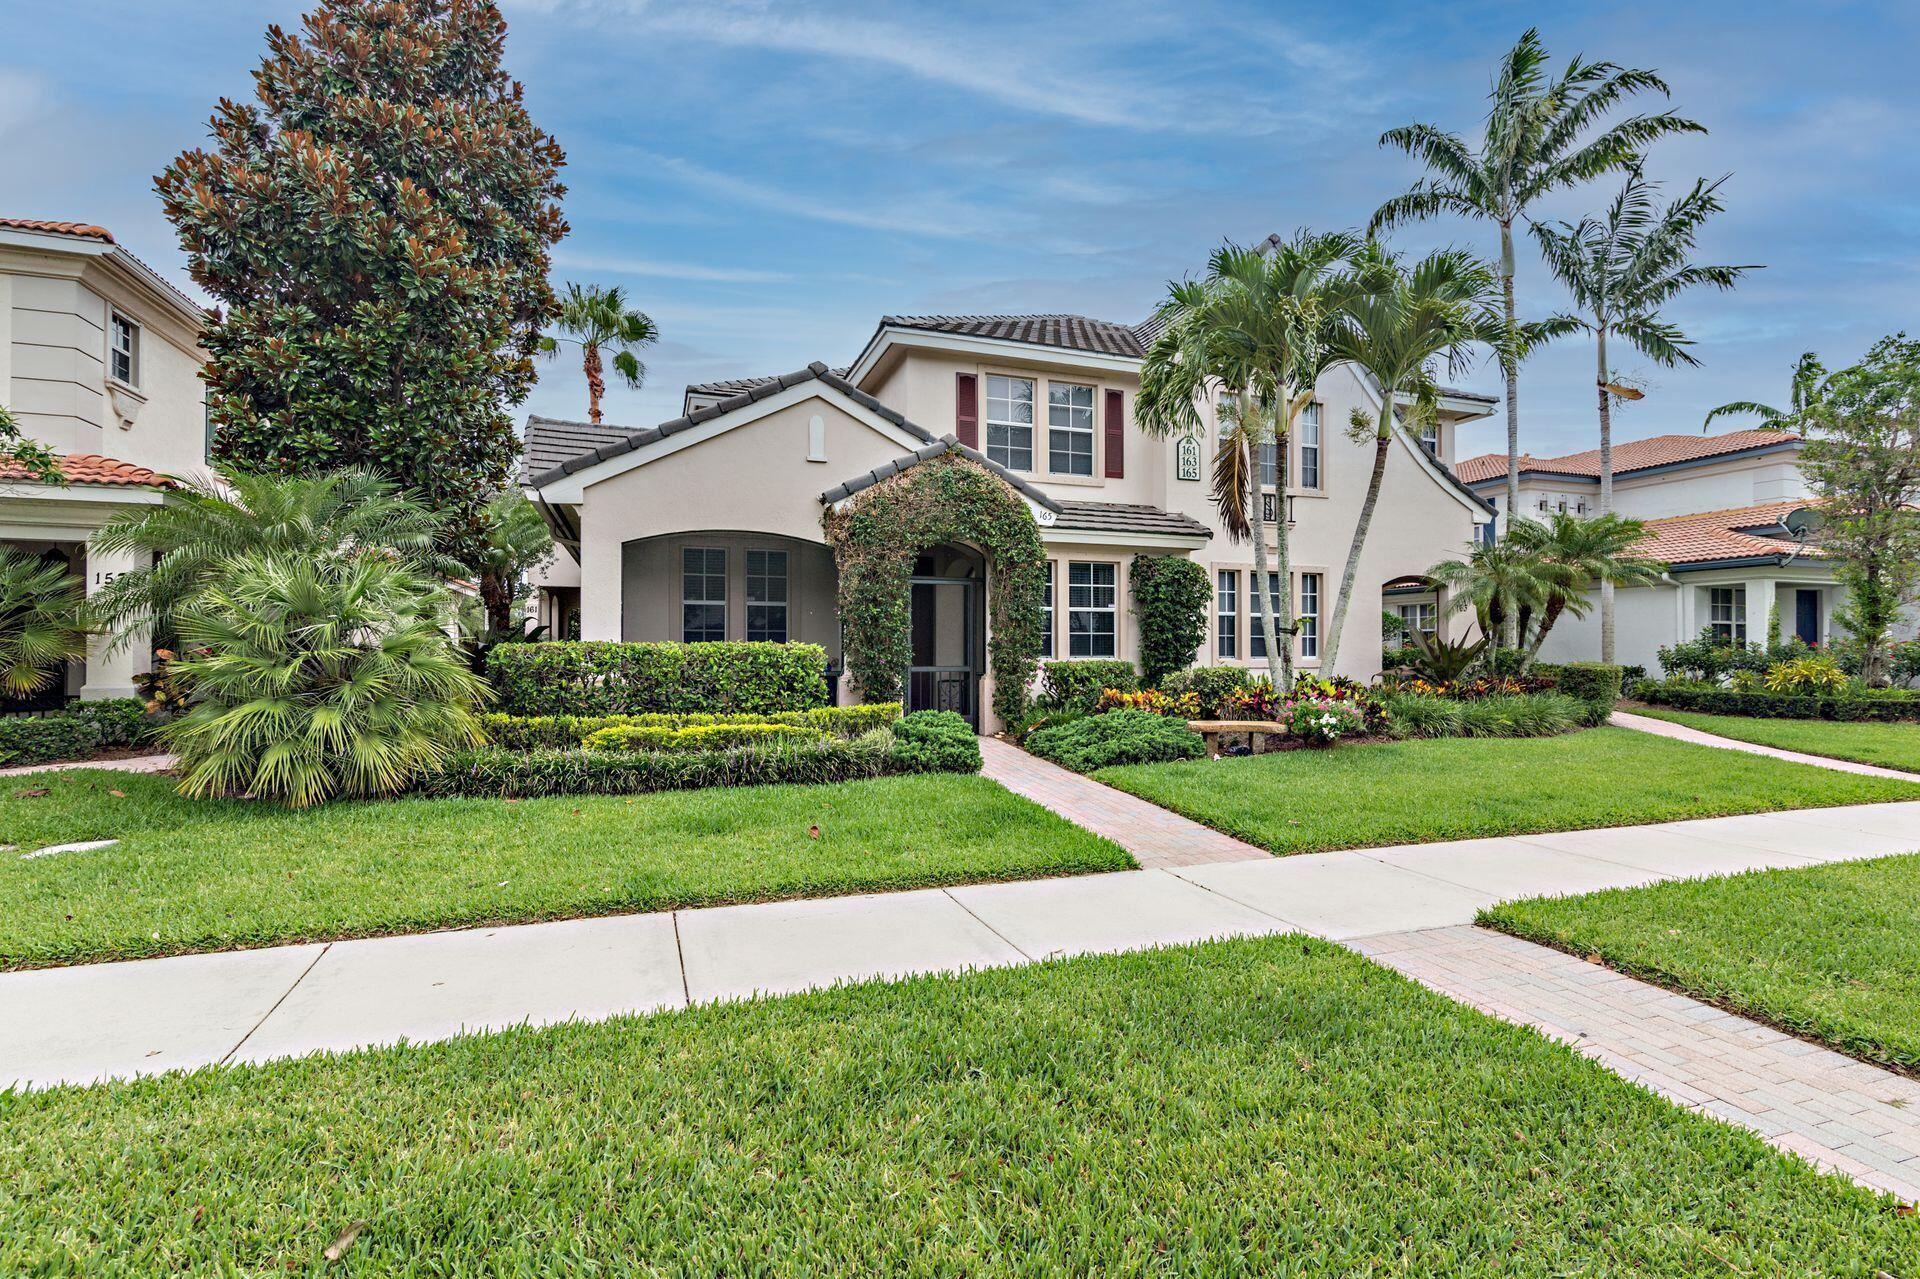 161 Evergrene Parkway, Palm Beach Gardens, FL 33410 - MLS#: RX-10726977